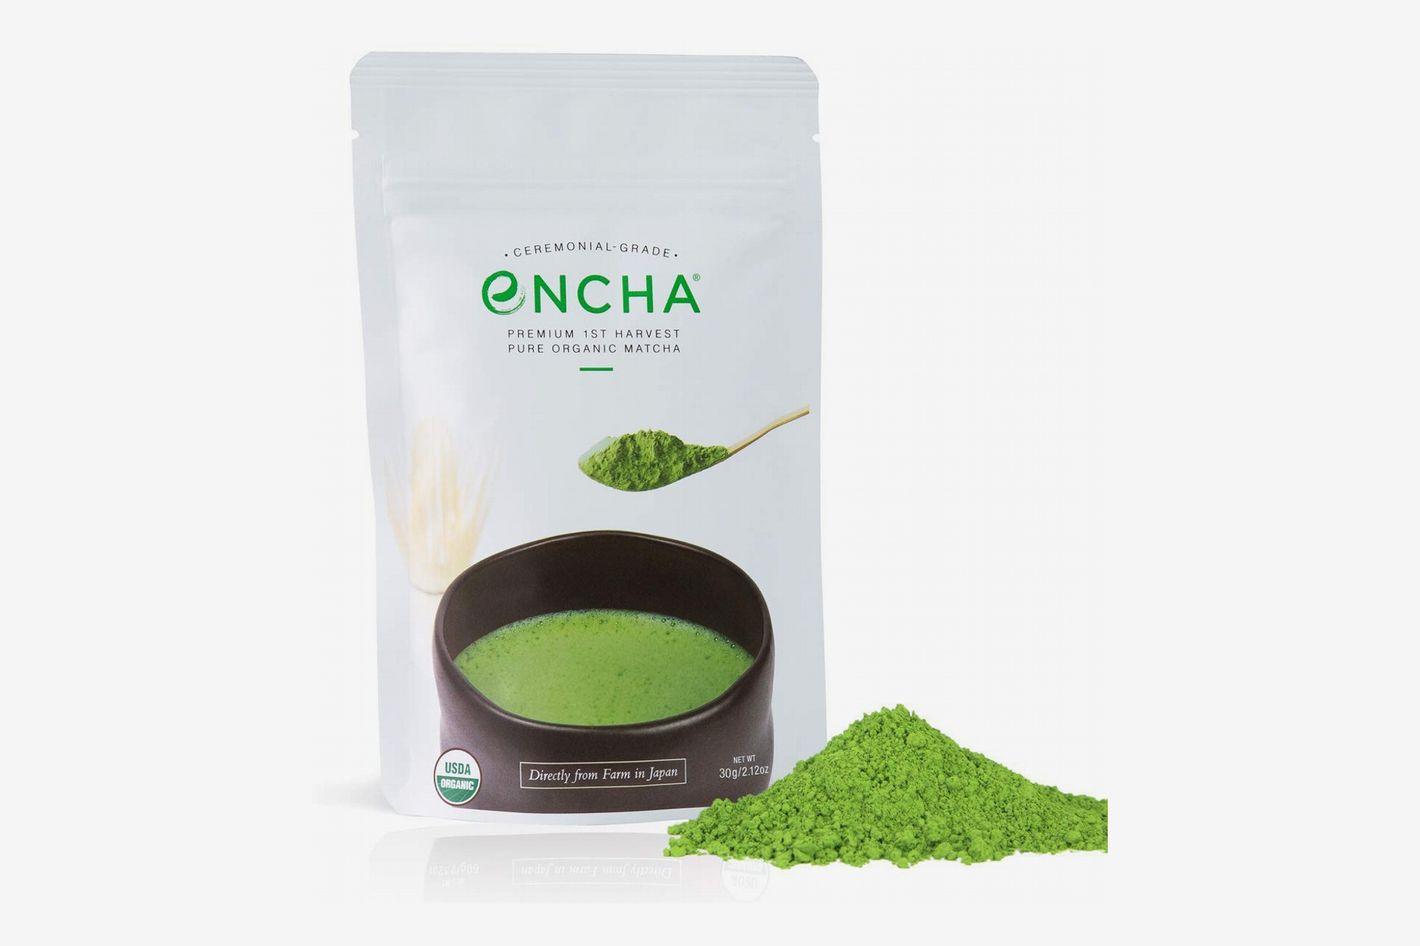 Encha Ceremonial Grade Organic Matcha